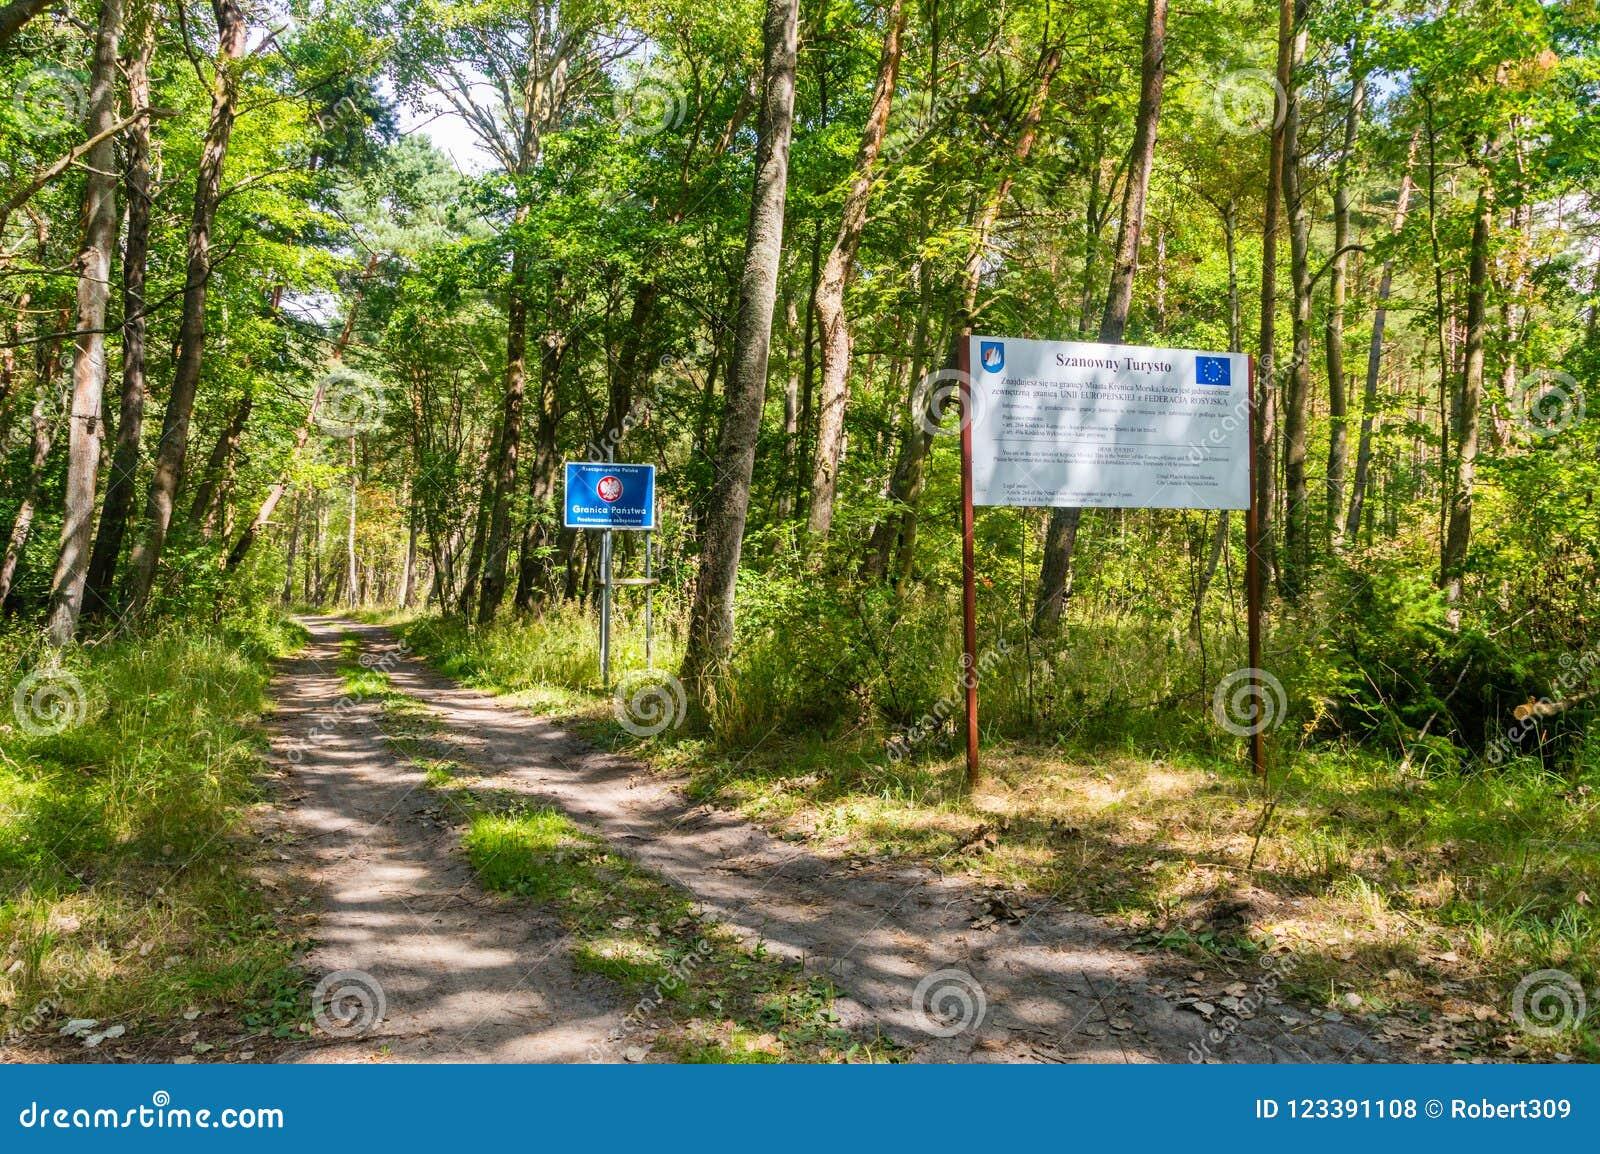 Border Republic of Poland - Russian Federation border at Nowa Karczma in Krynica Morska.